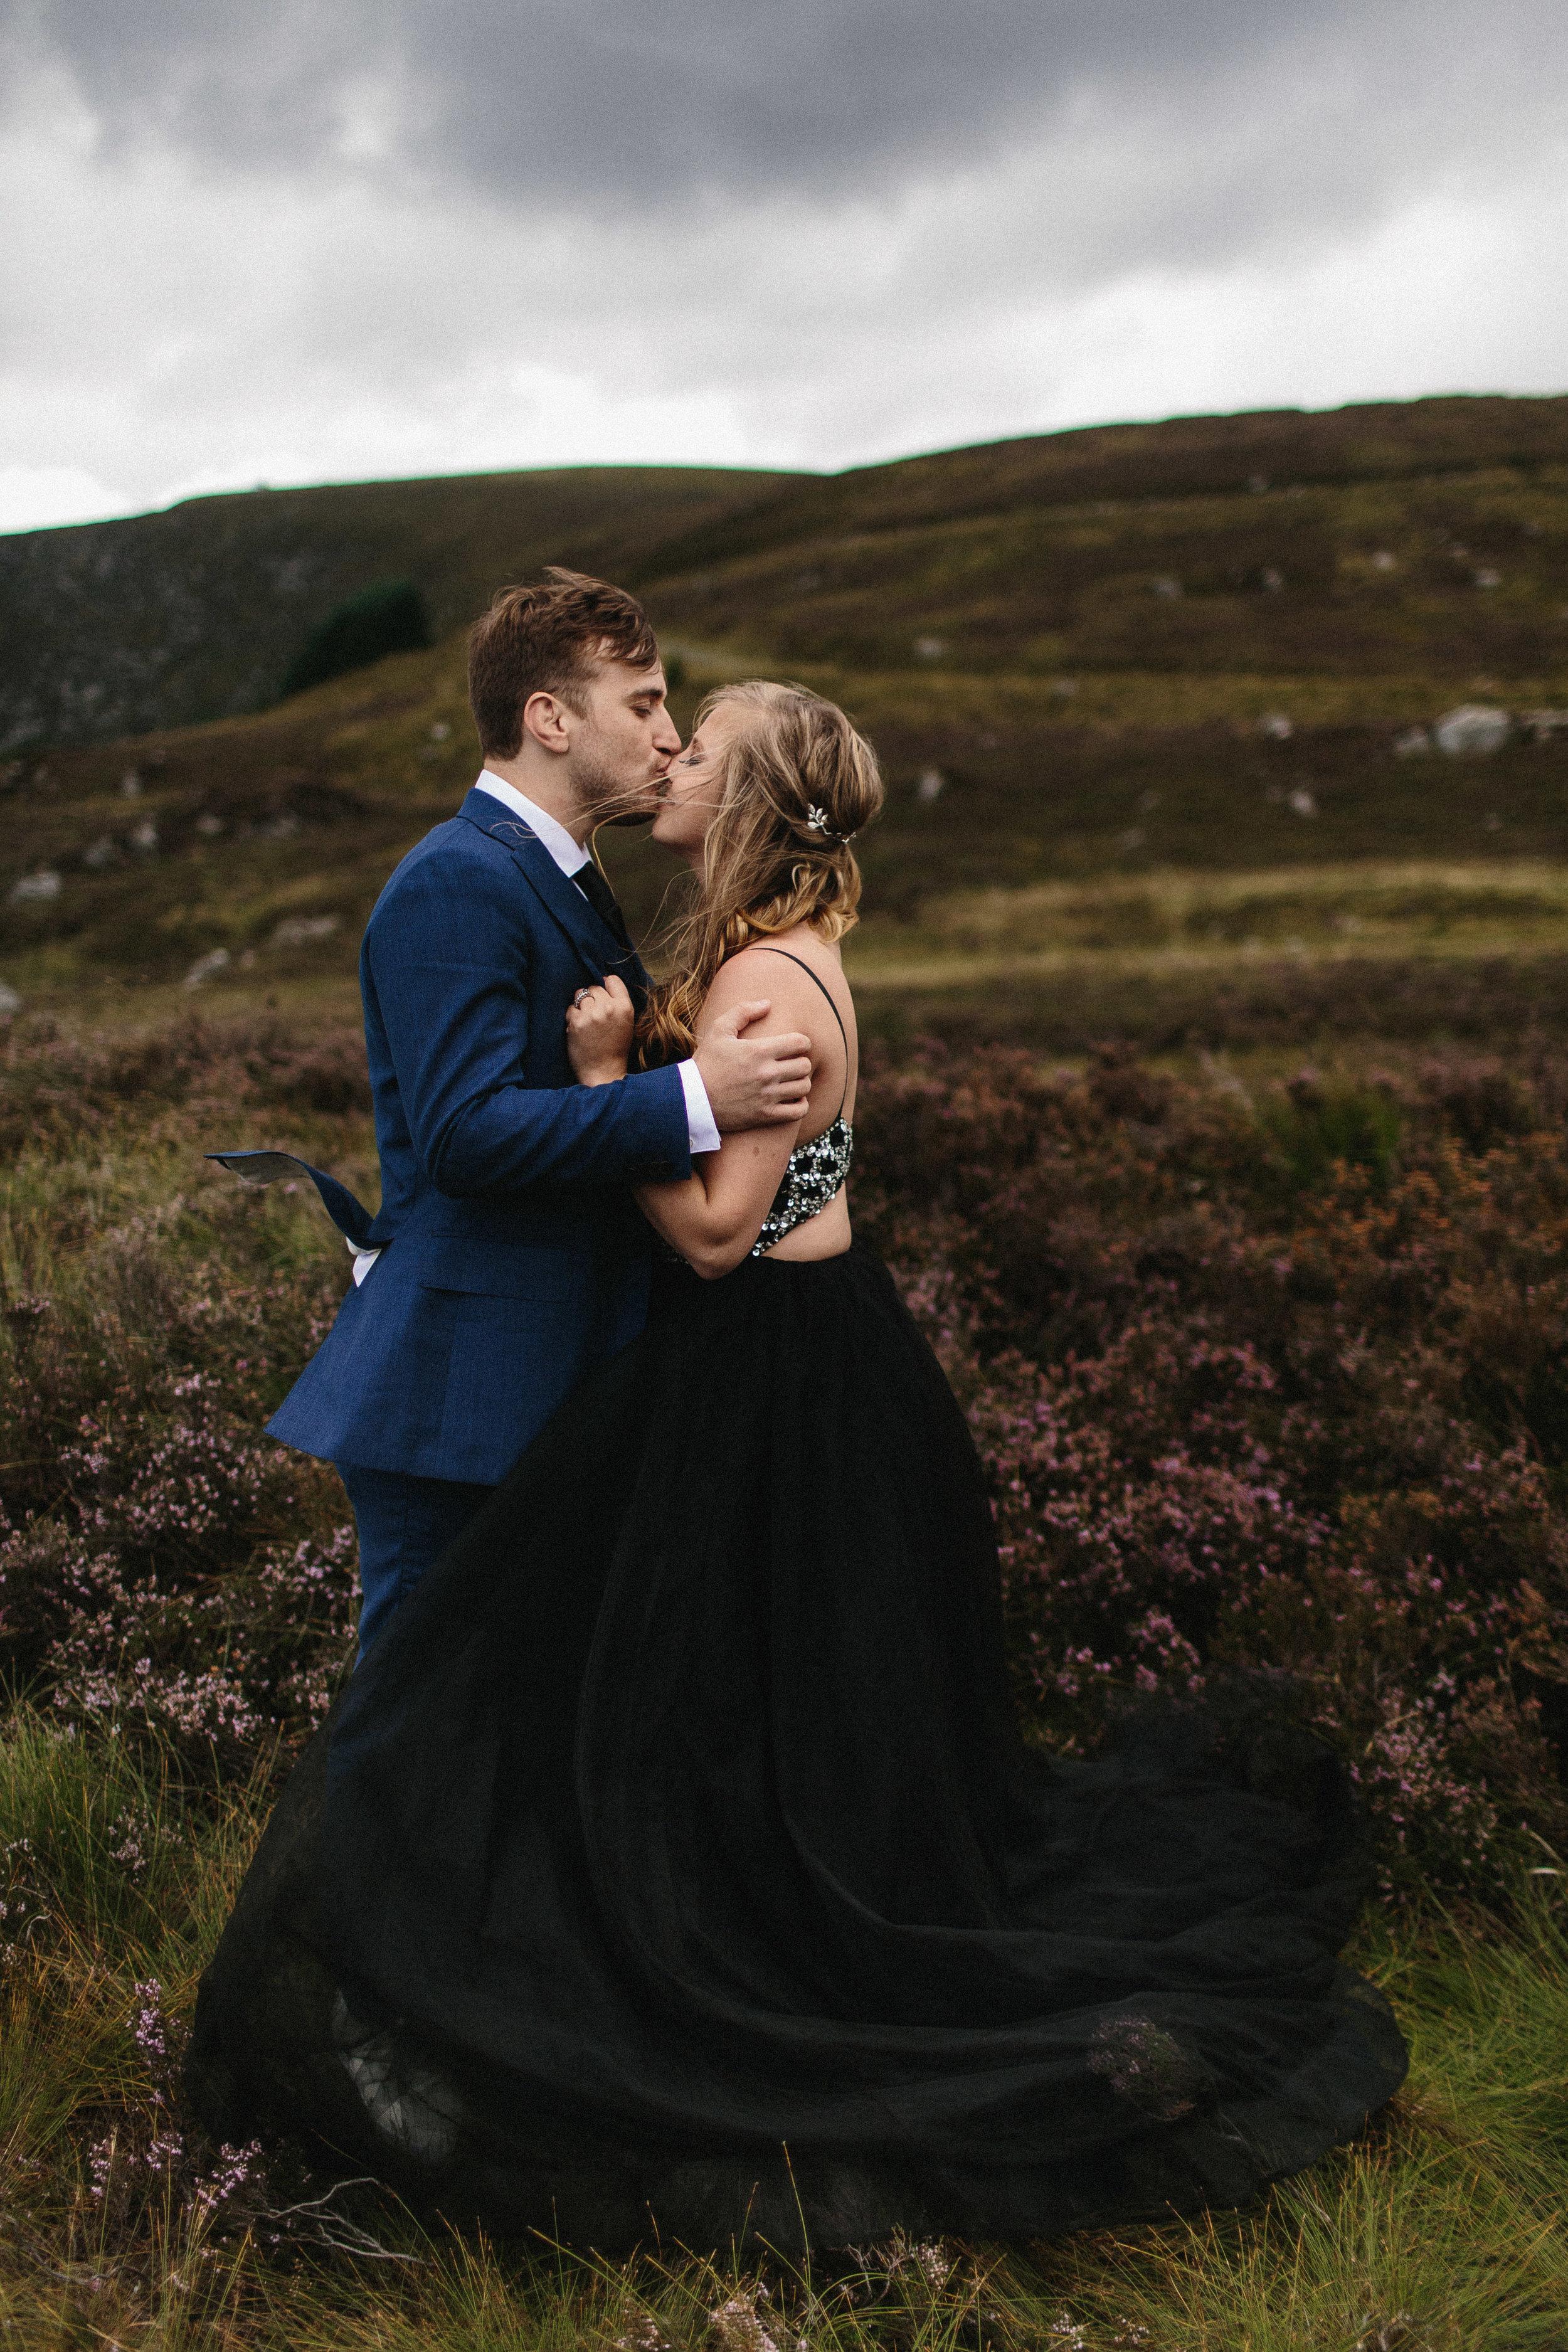 ireland_elopement_black_wedding_dress_wicklow_glendalough_athy_st_kevins_way_1599.jpg